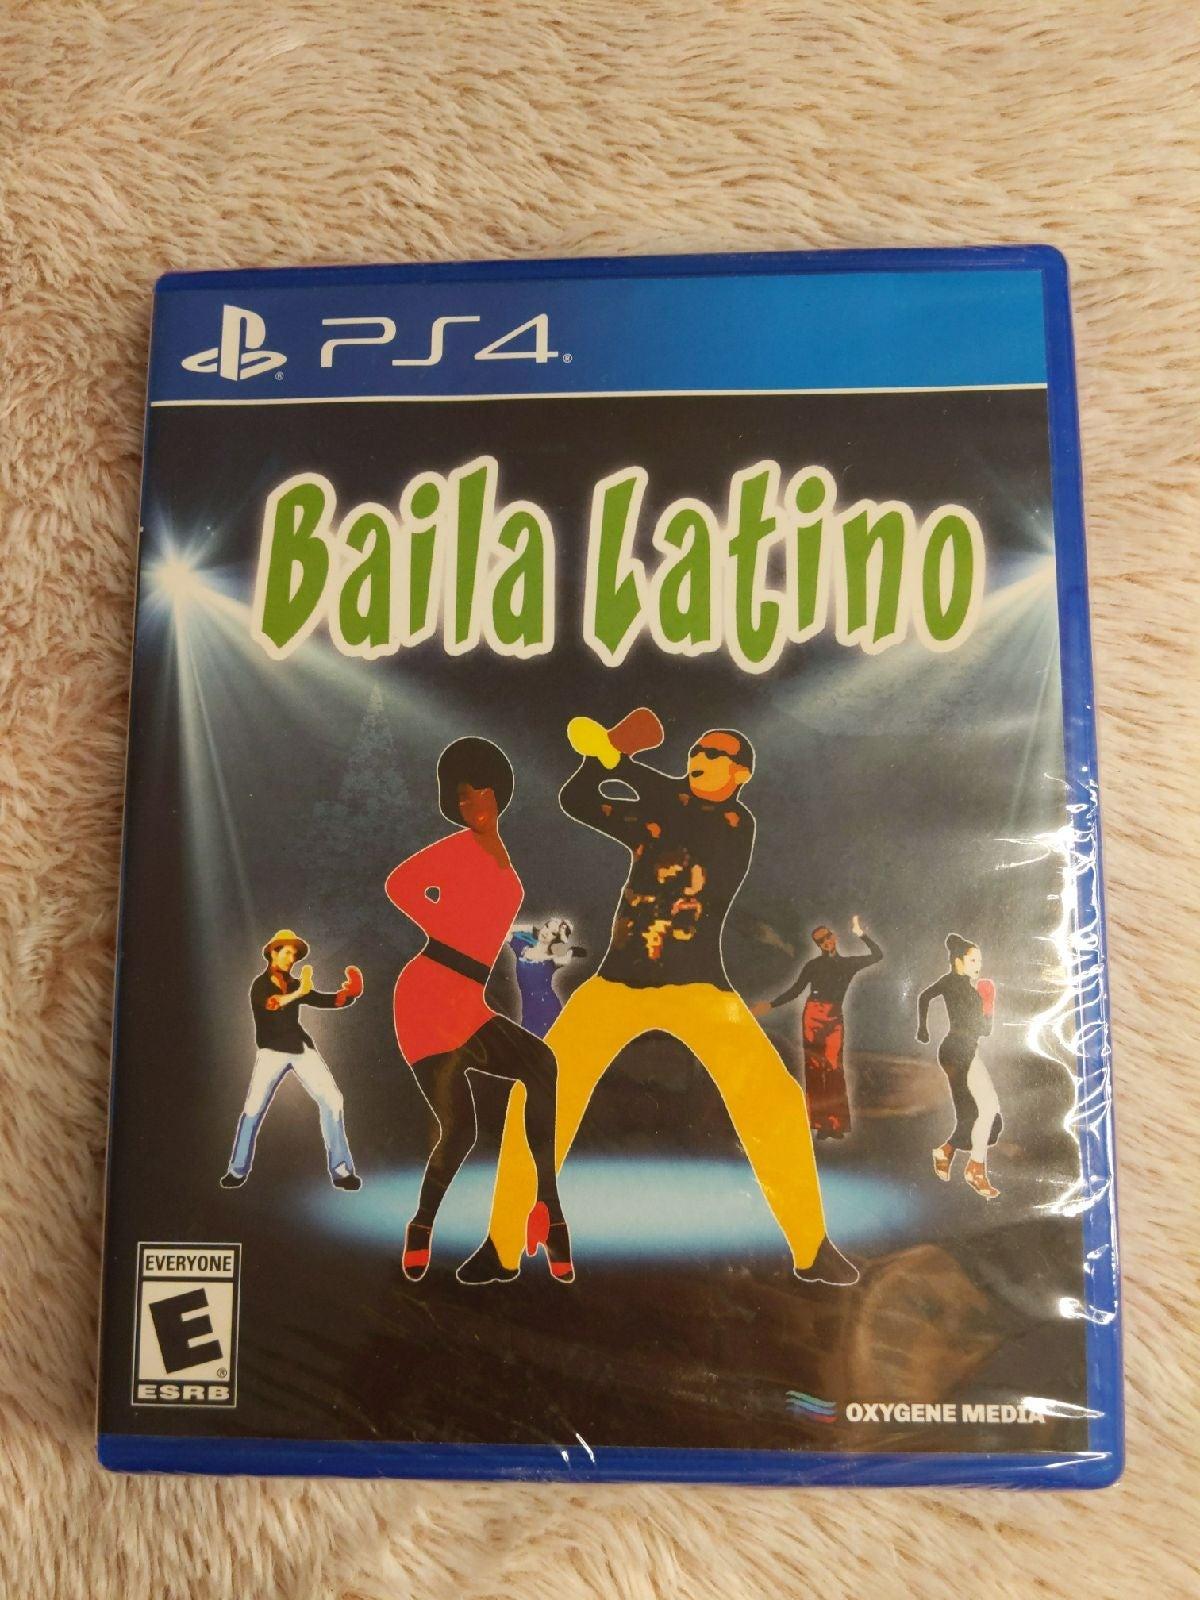 Brand new PS4 Baila Latino game